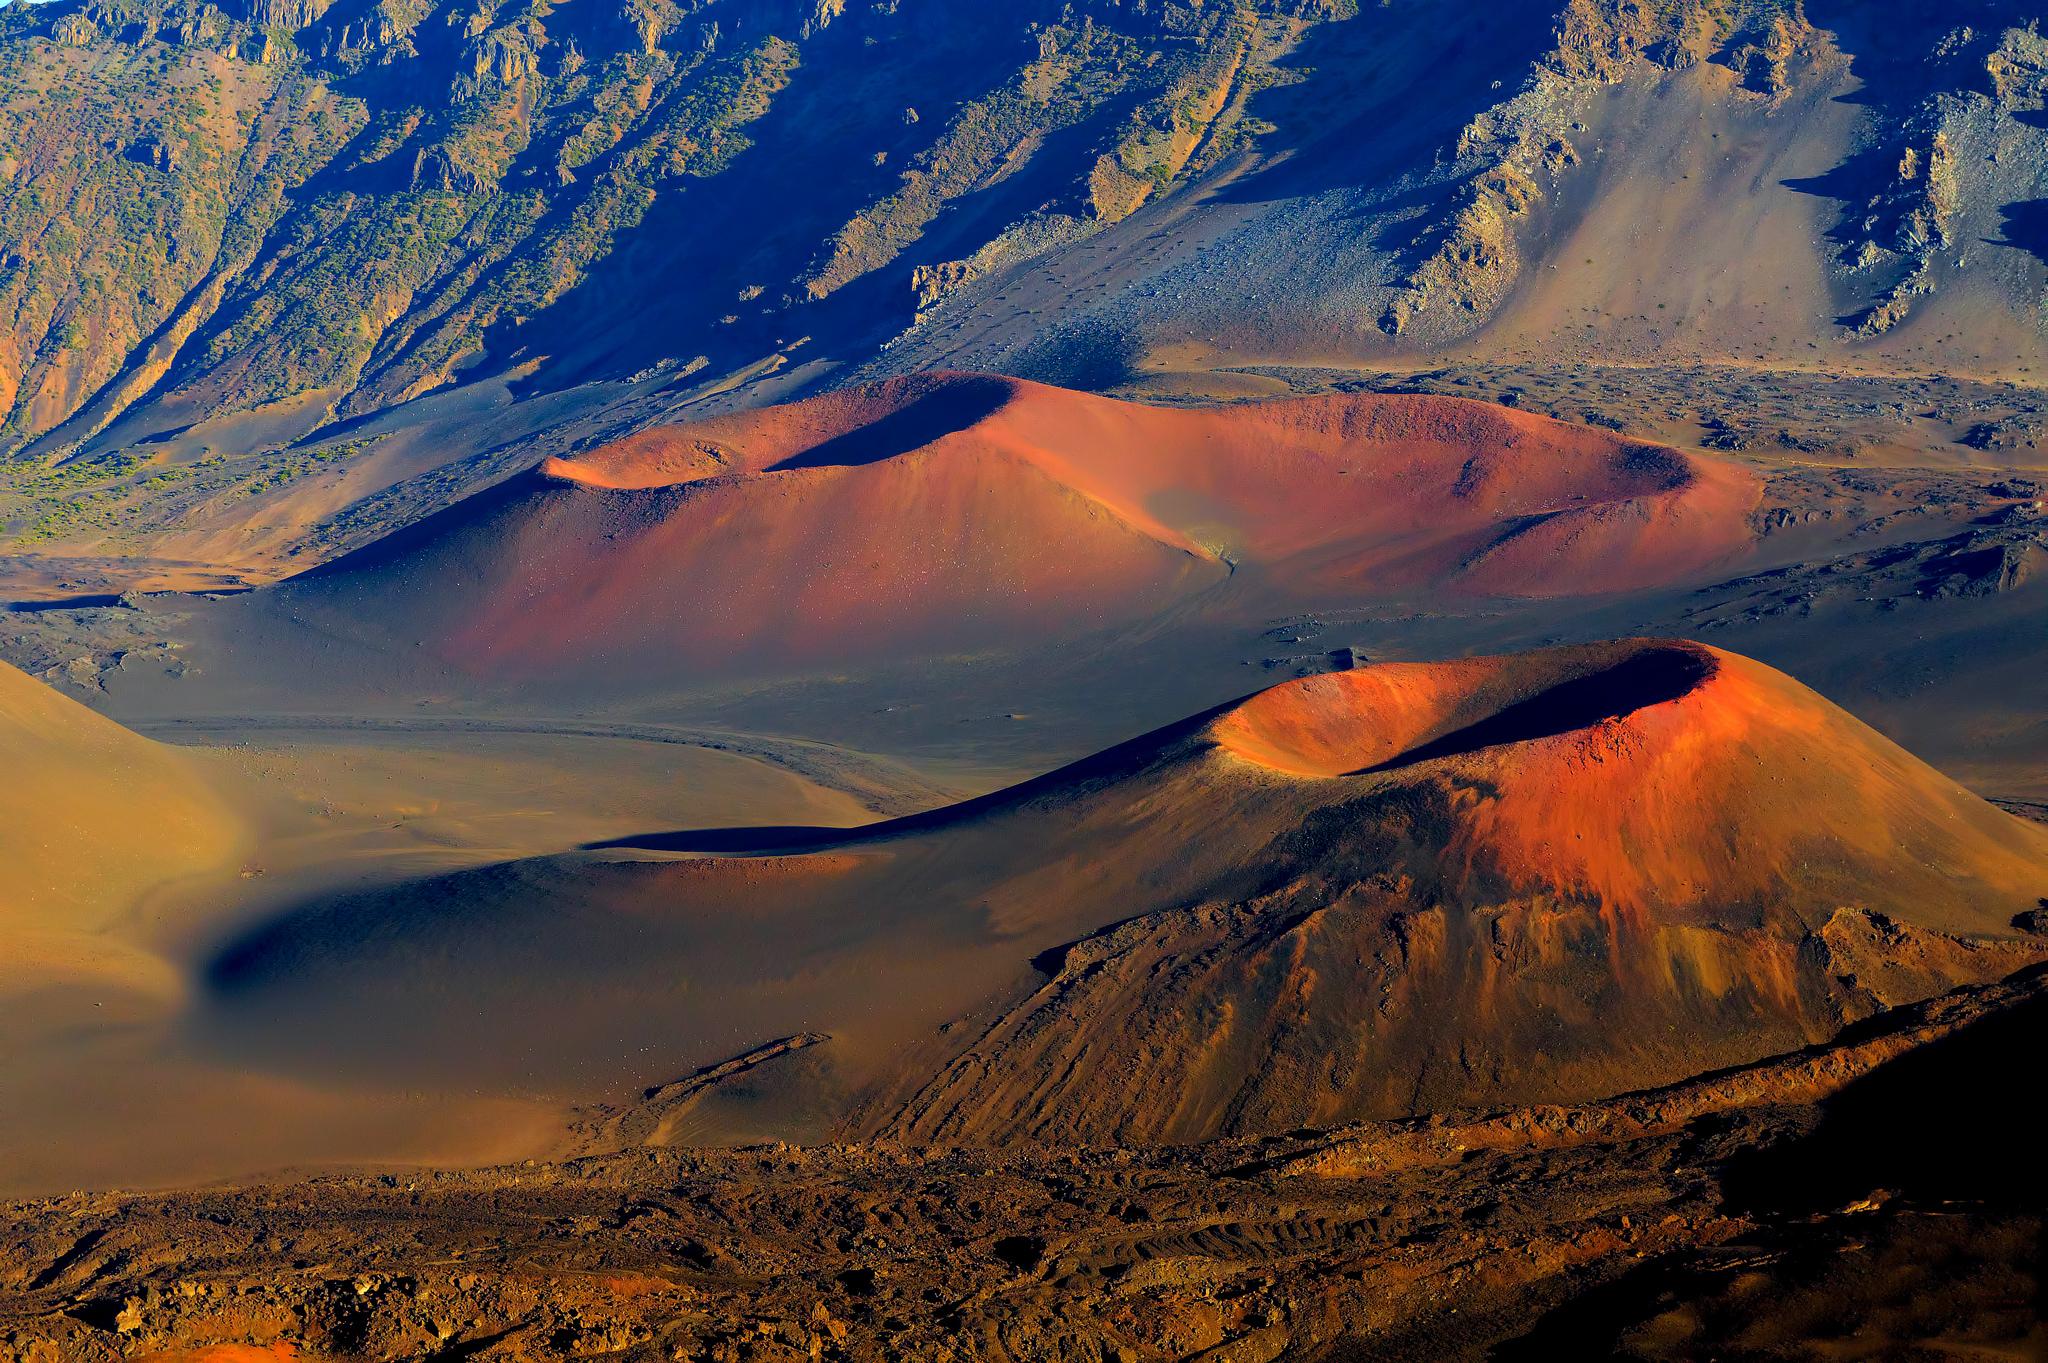 Haleakala national park maui hawaii full hd wallpaper and earth volcano mountain landscape hawaii scenic wallpaper publicscrutiny Image collections